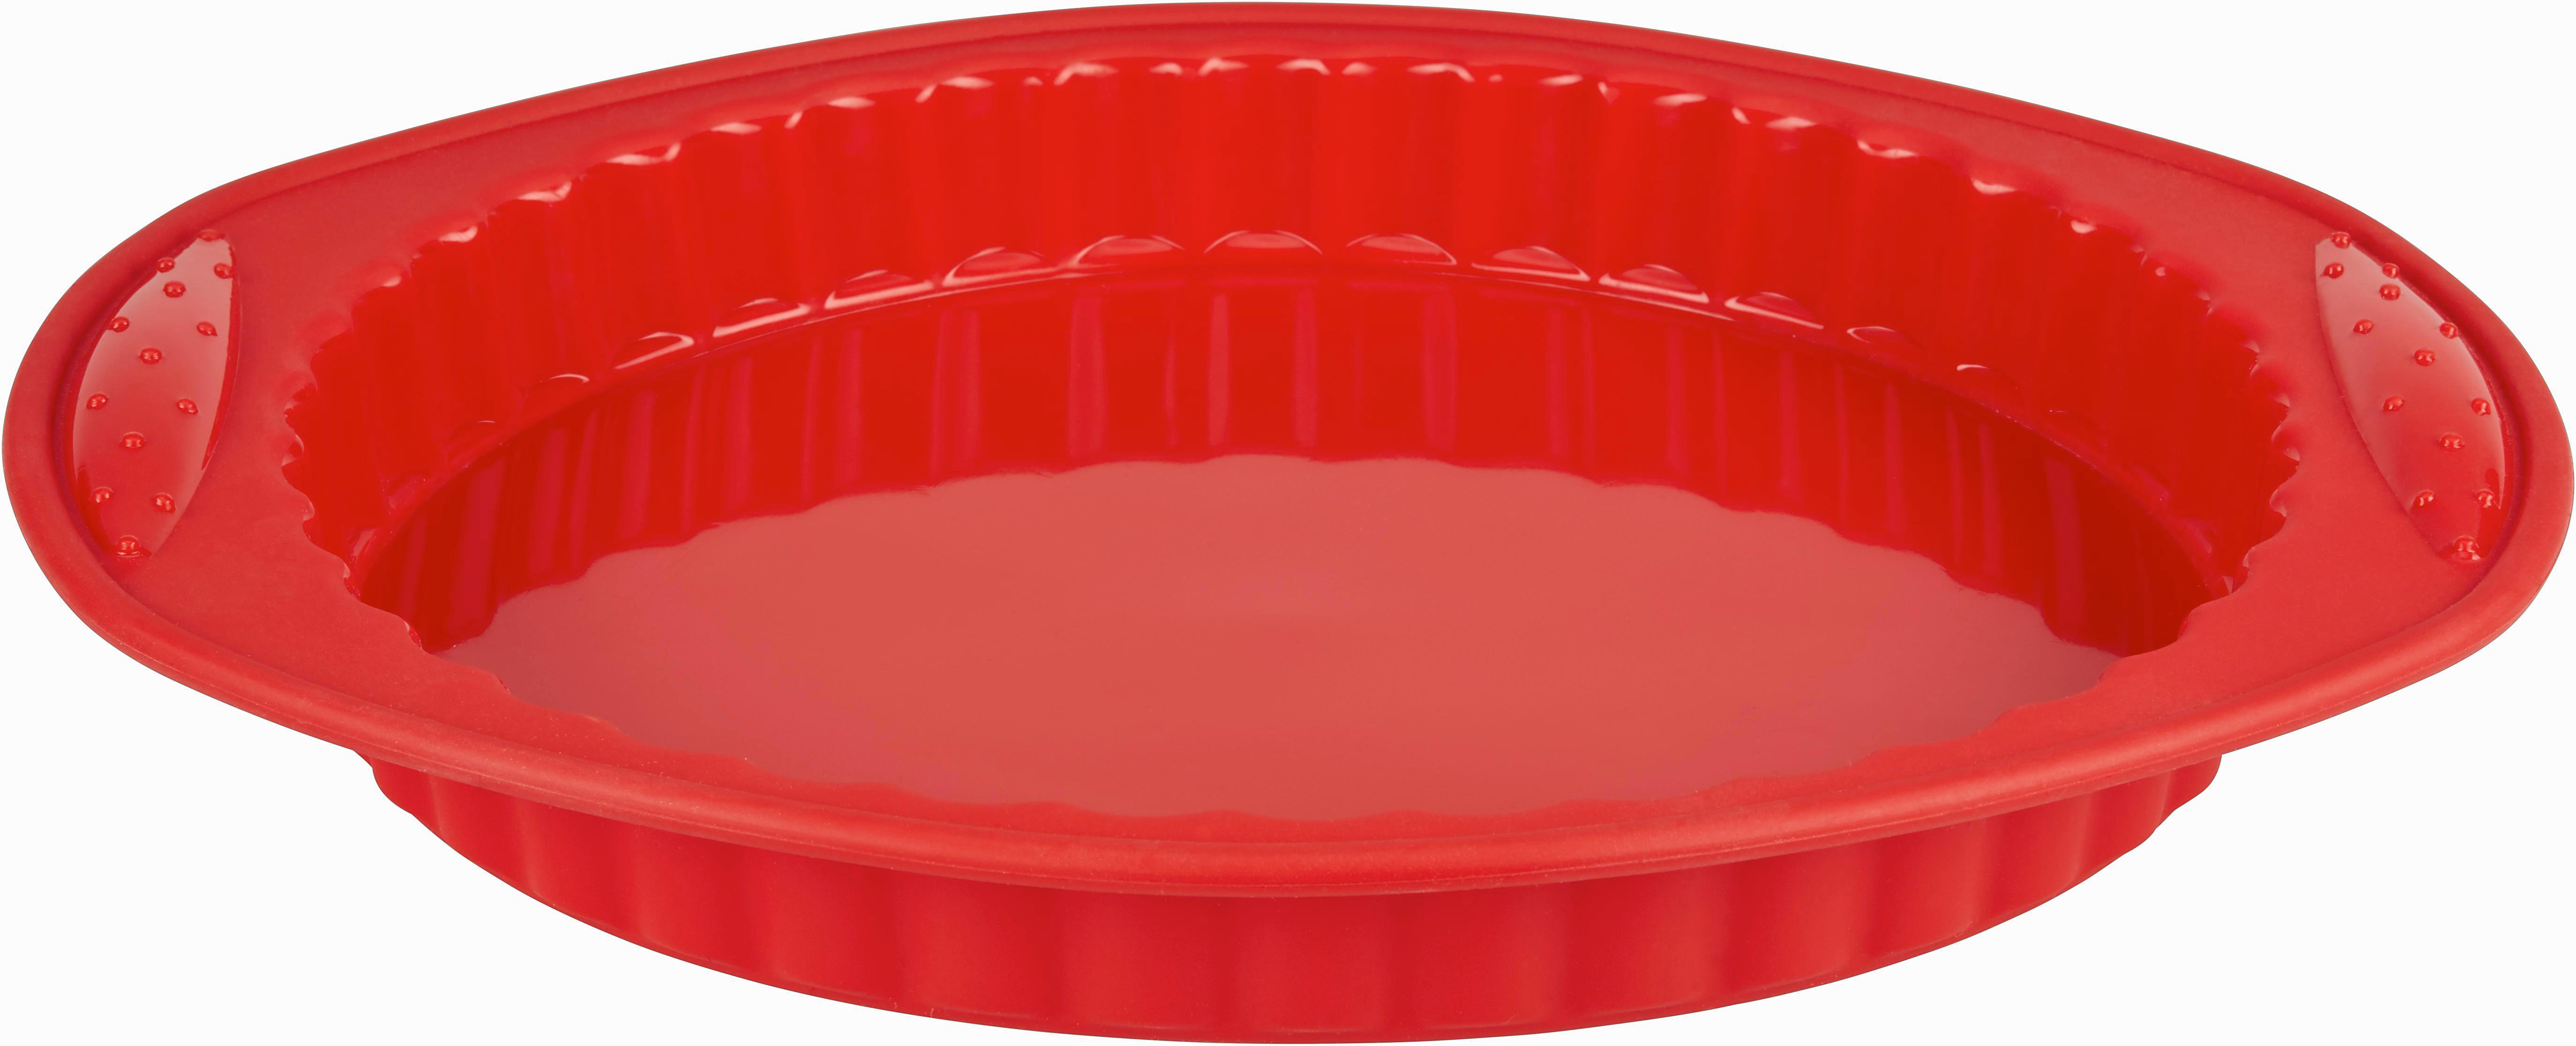 Backform Silke in Rot aus Silikon - Rot, Kunststoff (30/26,5/3cm) - MÖMAX modern living